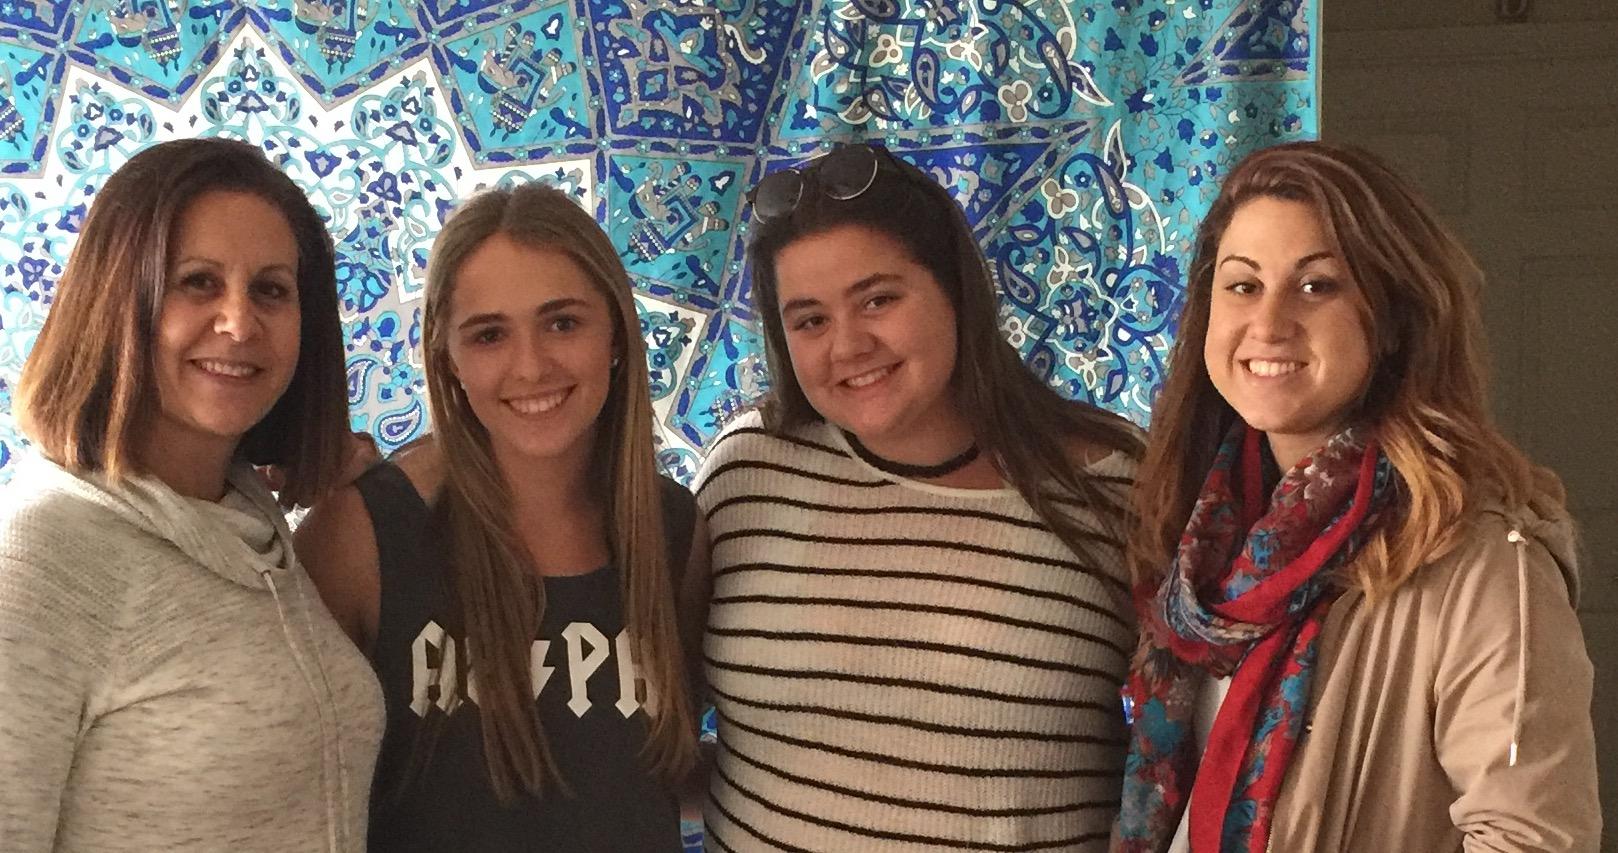 Ketti, Lexi, Melanie, and Francine.